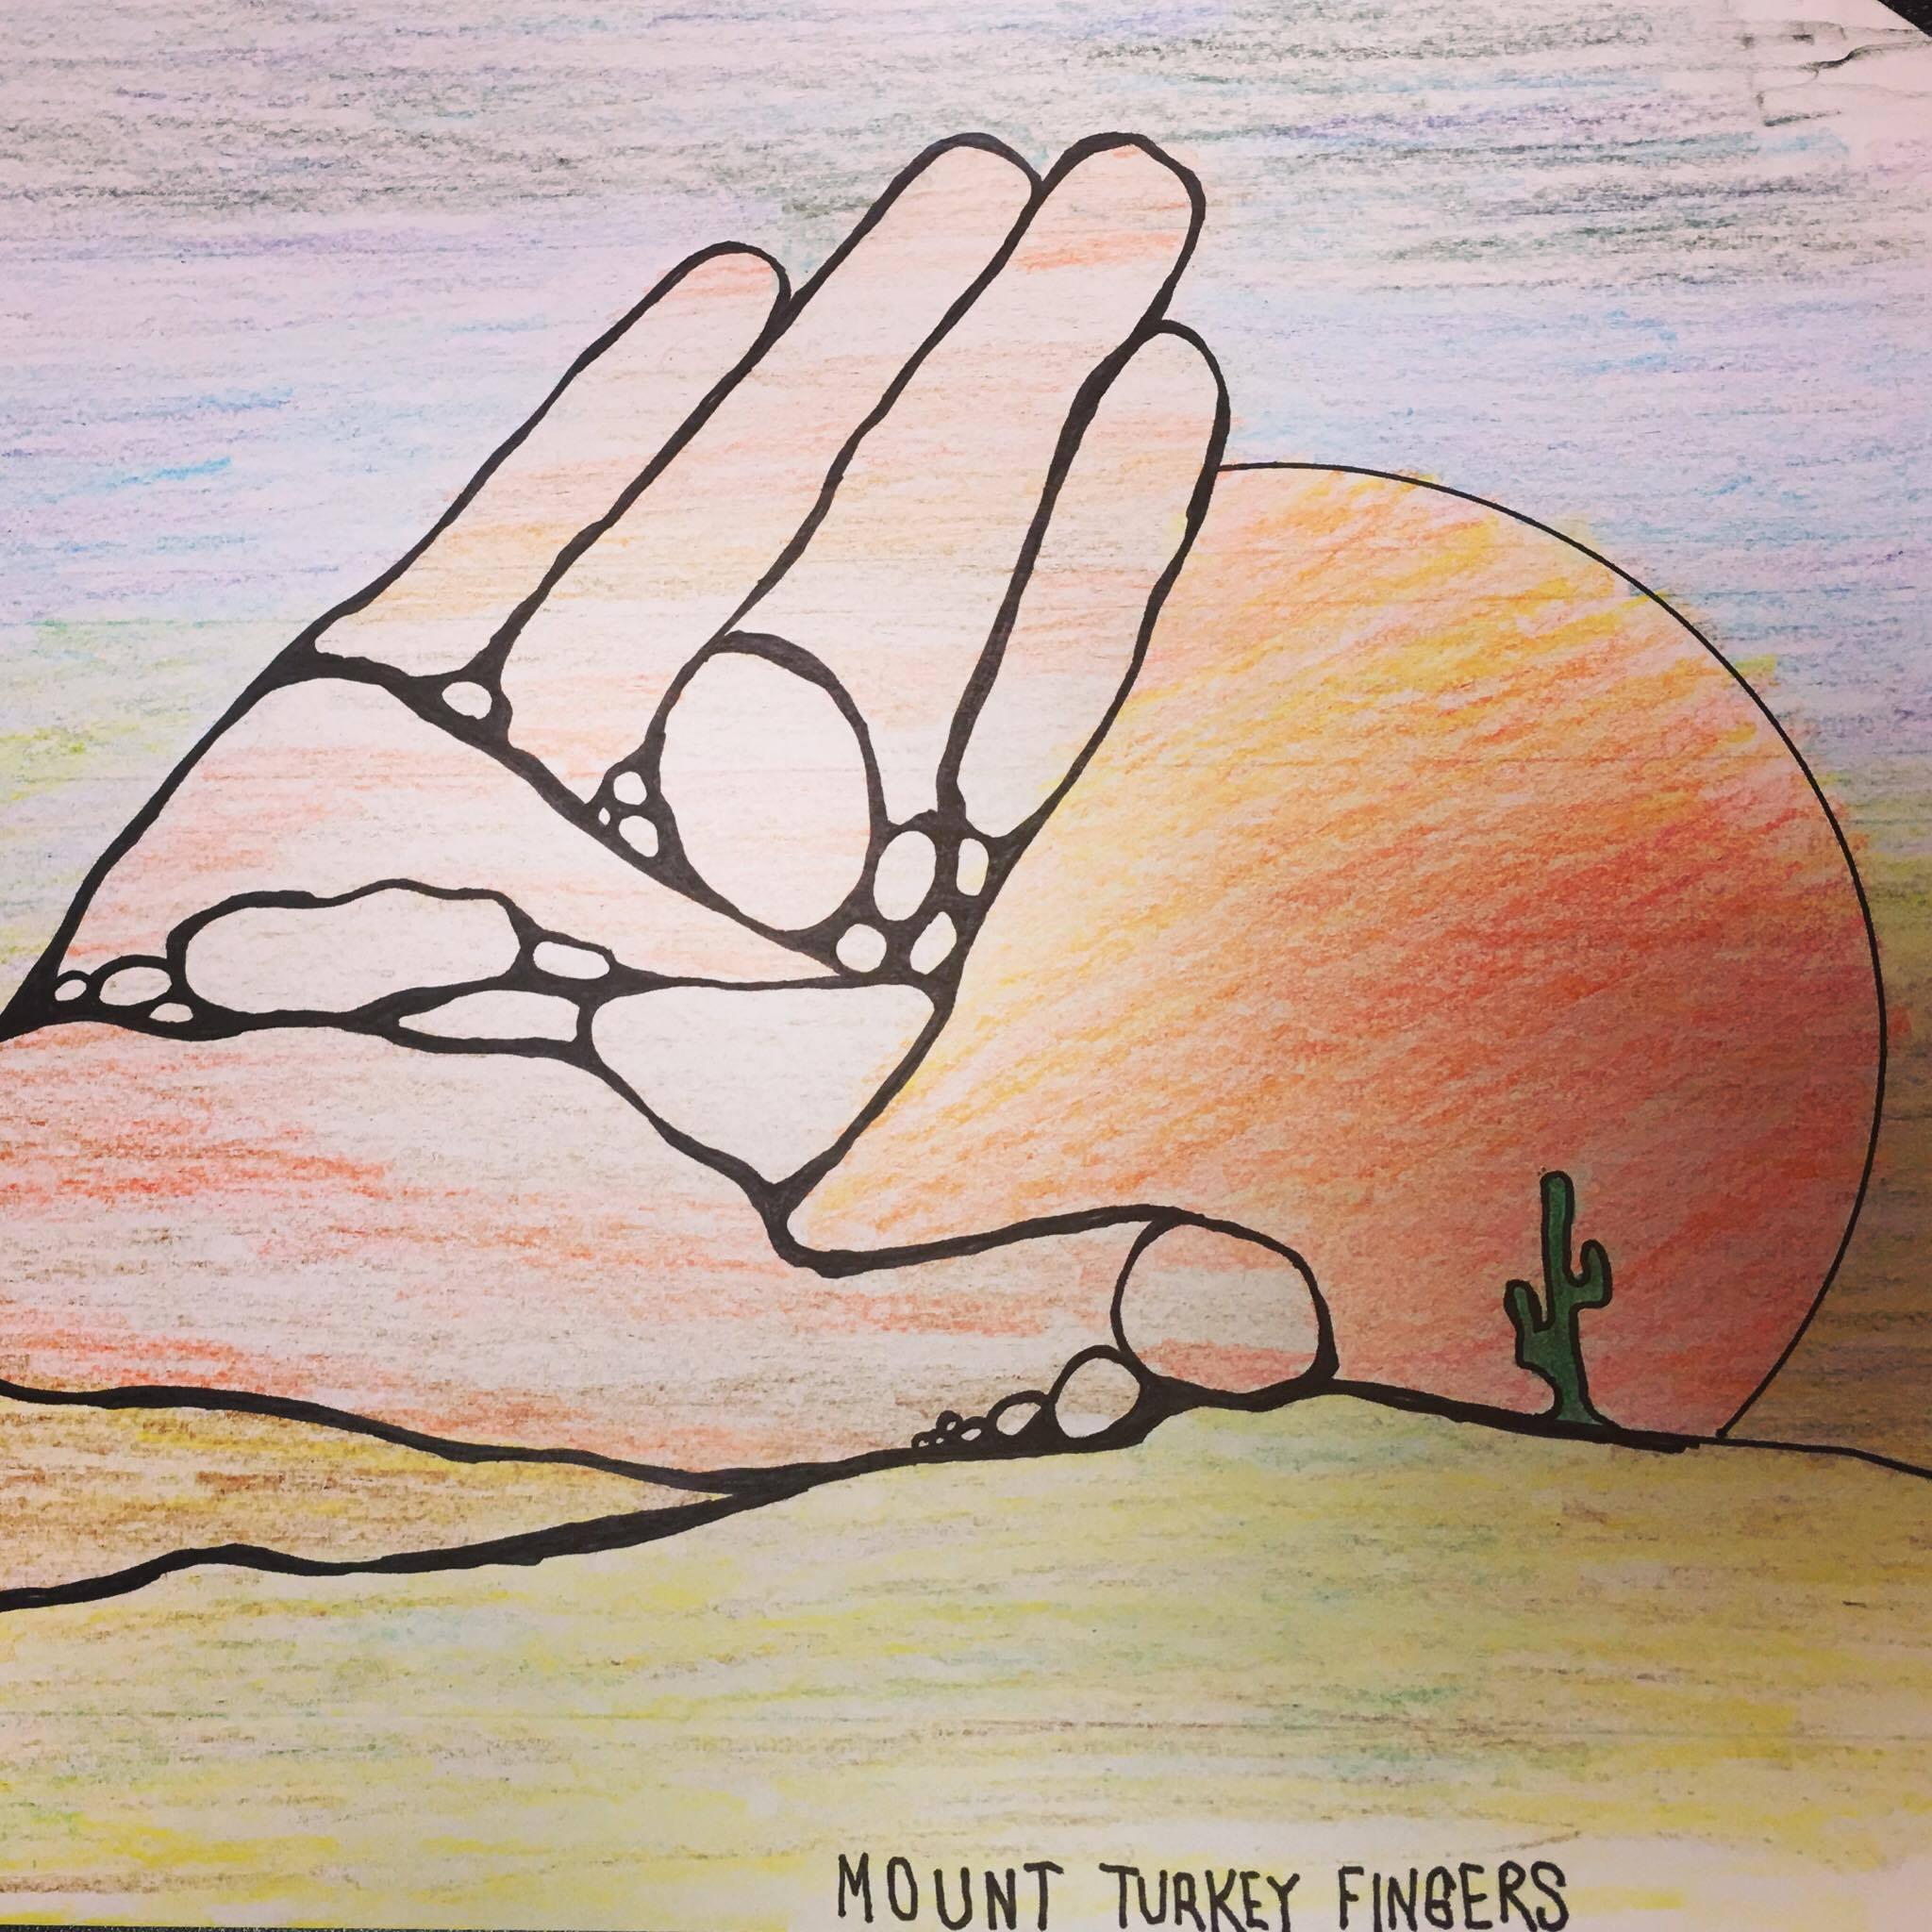 Lydia's Mysterious Mount Turkey Fingers